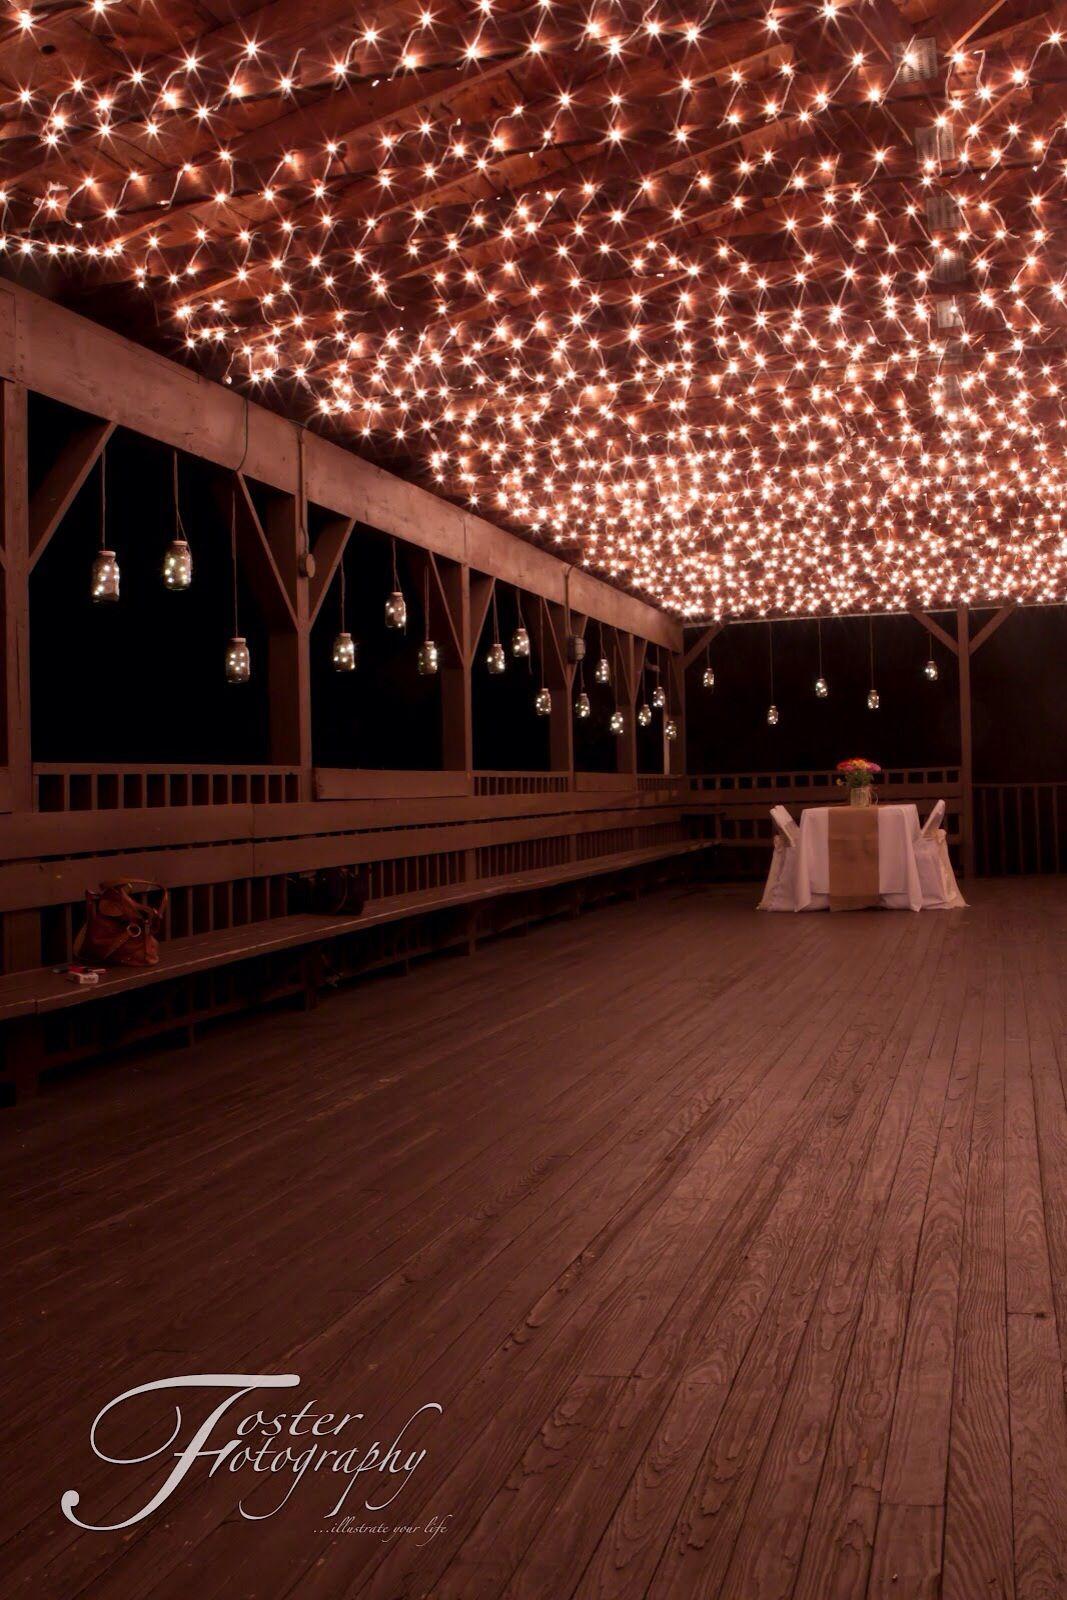 lights. decor. under the stars theme. … in 2019 | wedding